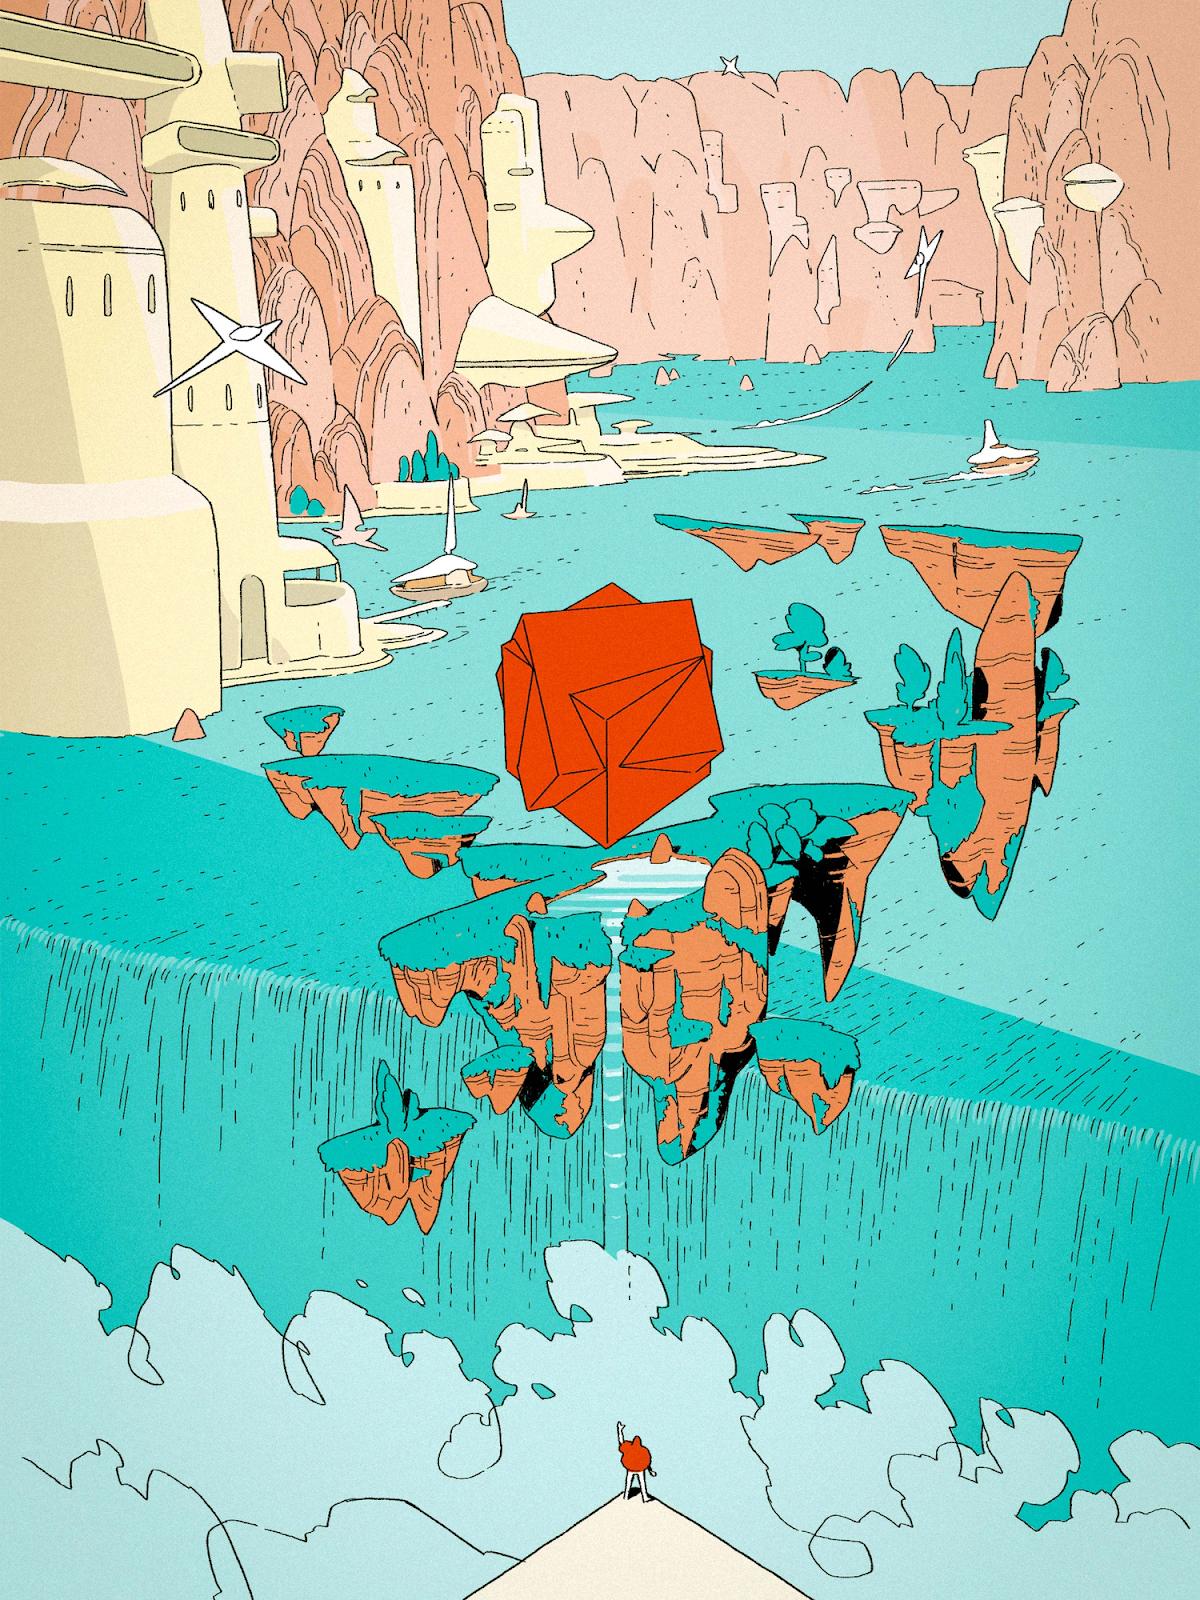 Illustration by Matias Basla, Liam Cobb, Jaedoo Lee, Ilya Milstein for Collins